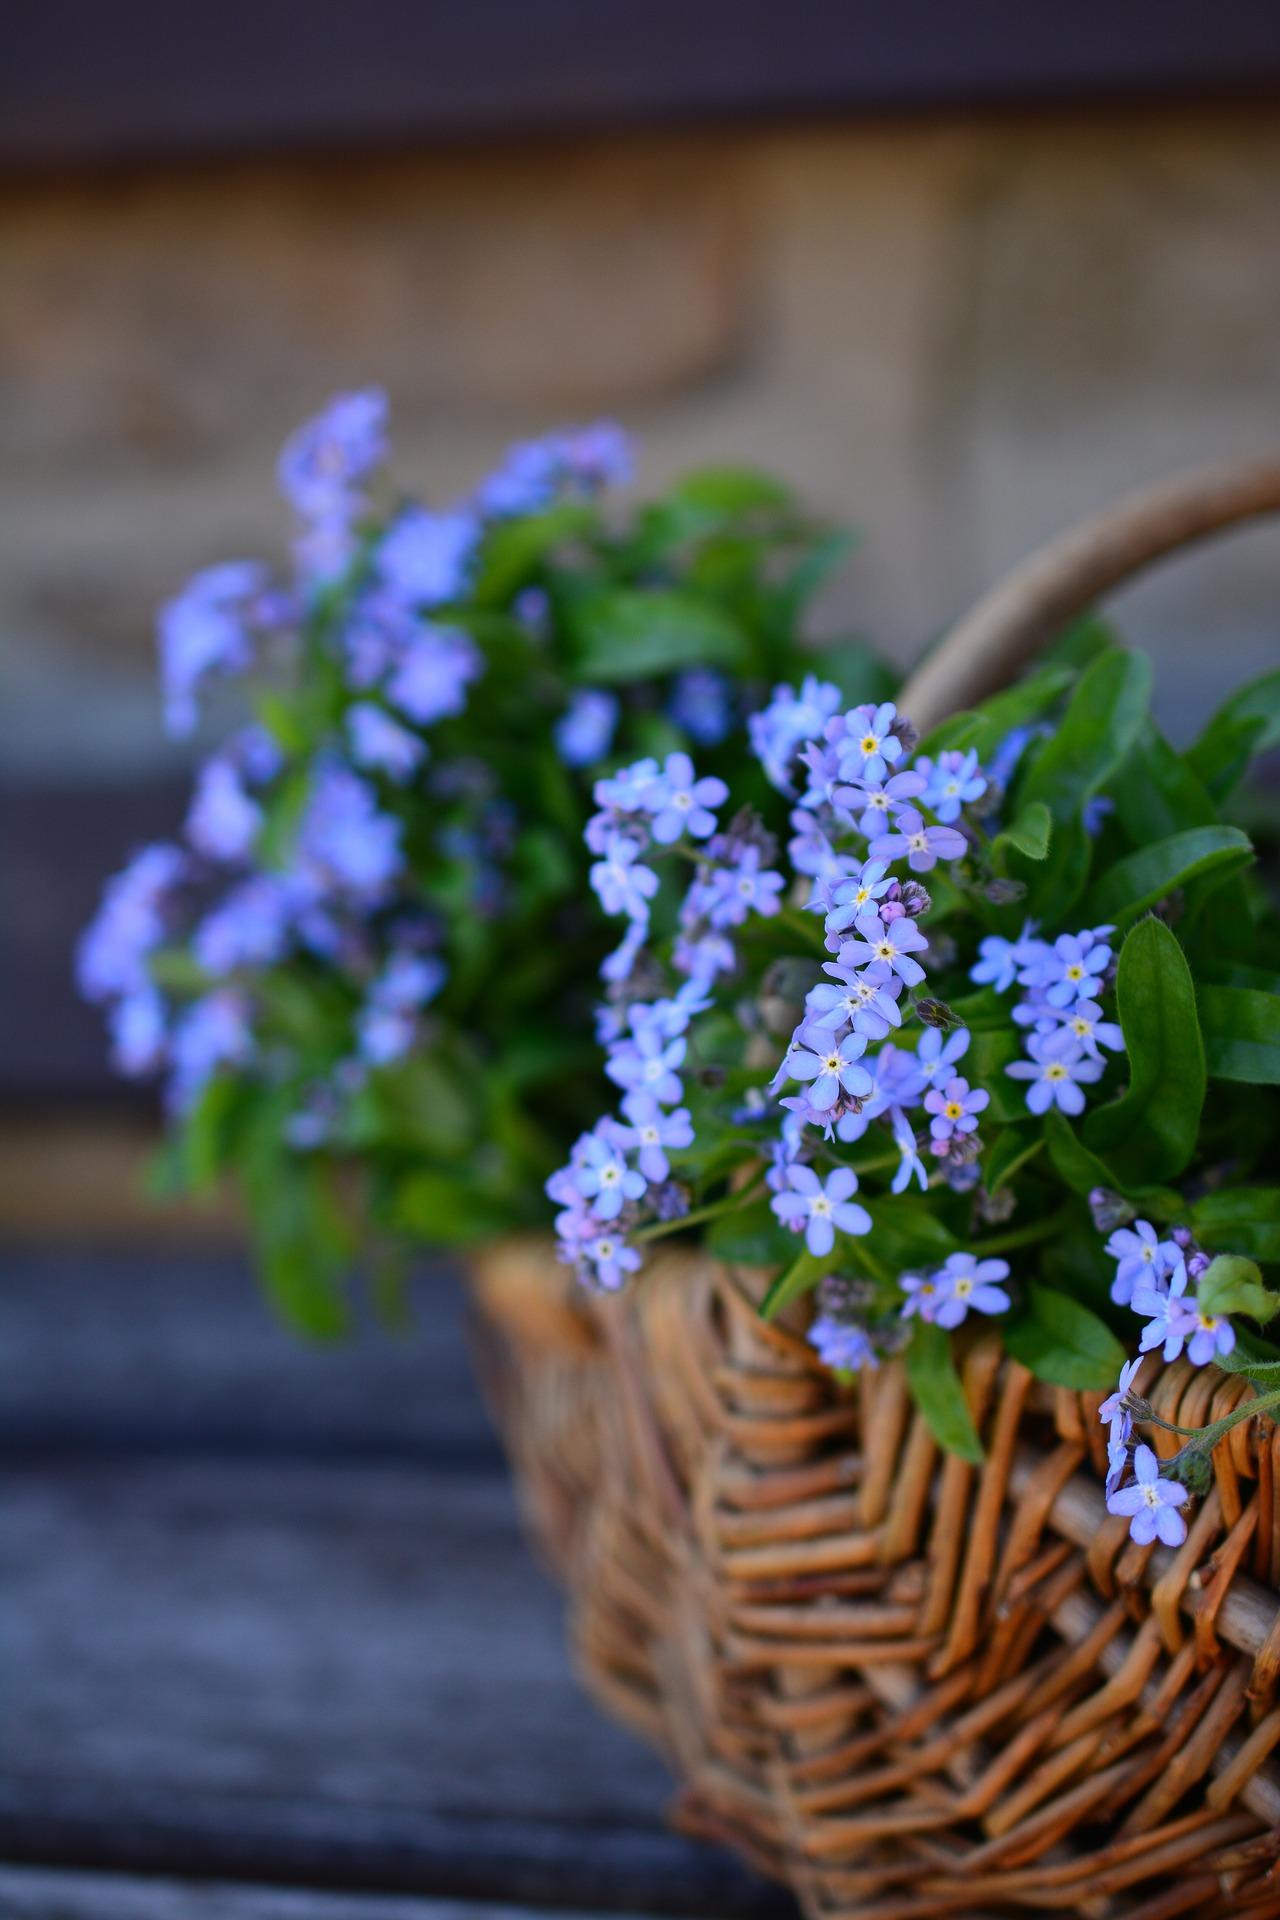 Funeral, forget-me-not blue flowers in wicker basket